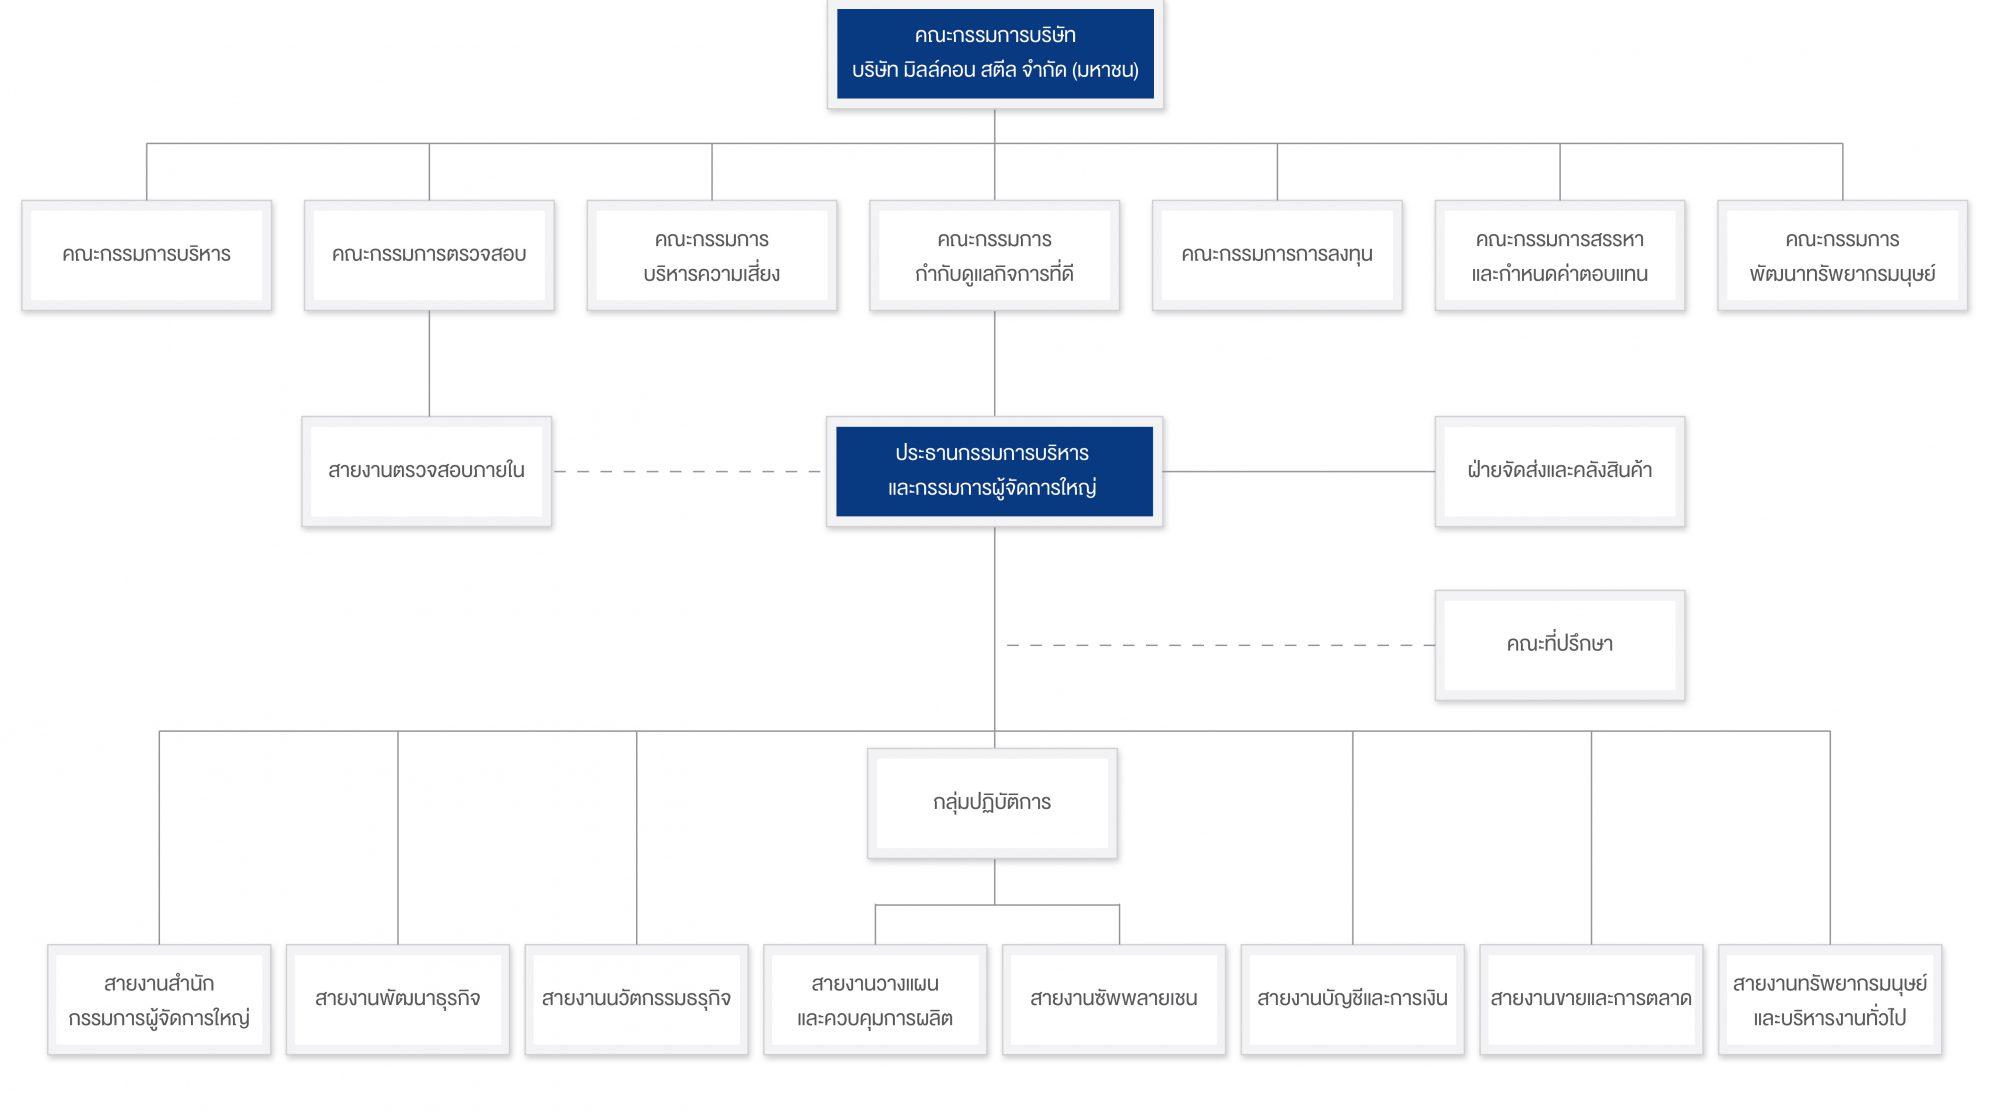 organization chart 2019 -th-01